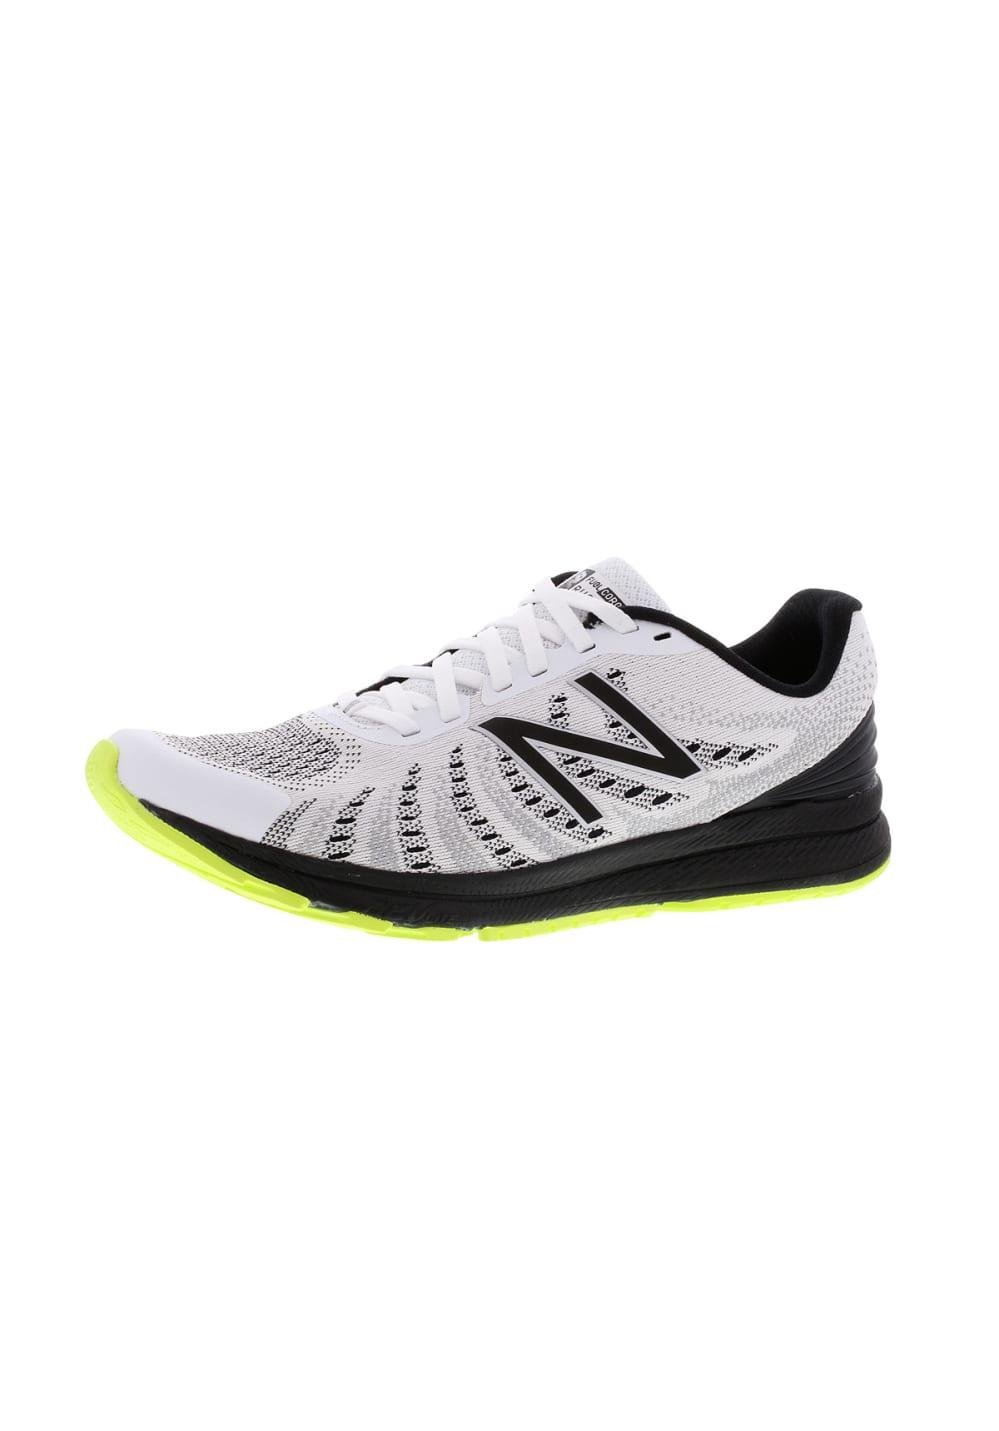 dd1d8a7b336ca New Balance FuelCore Rush V3 - Running shoes for Men - White | 21RUN